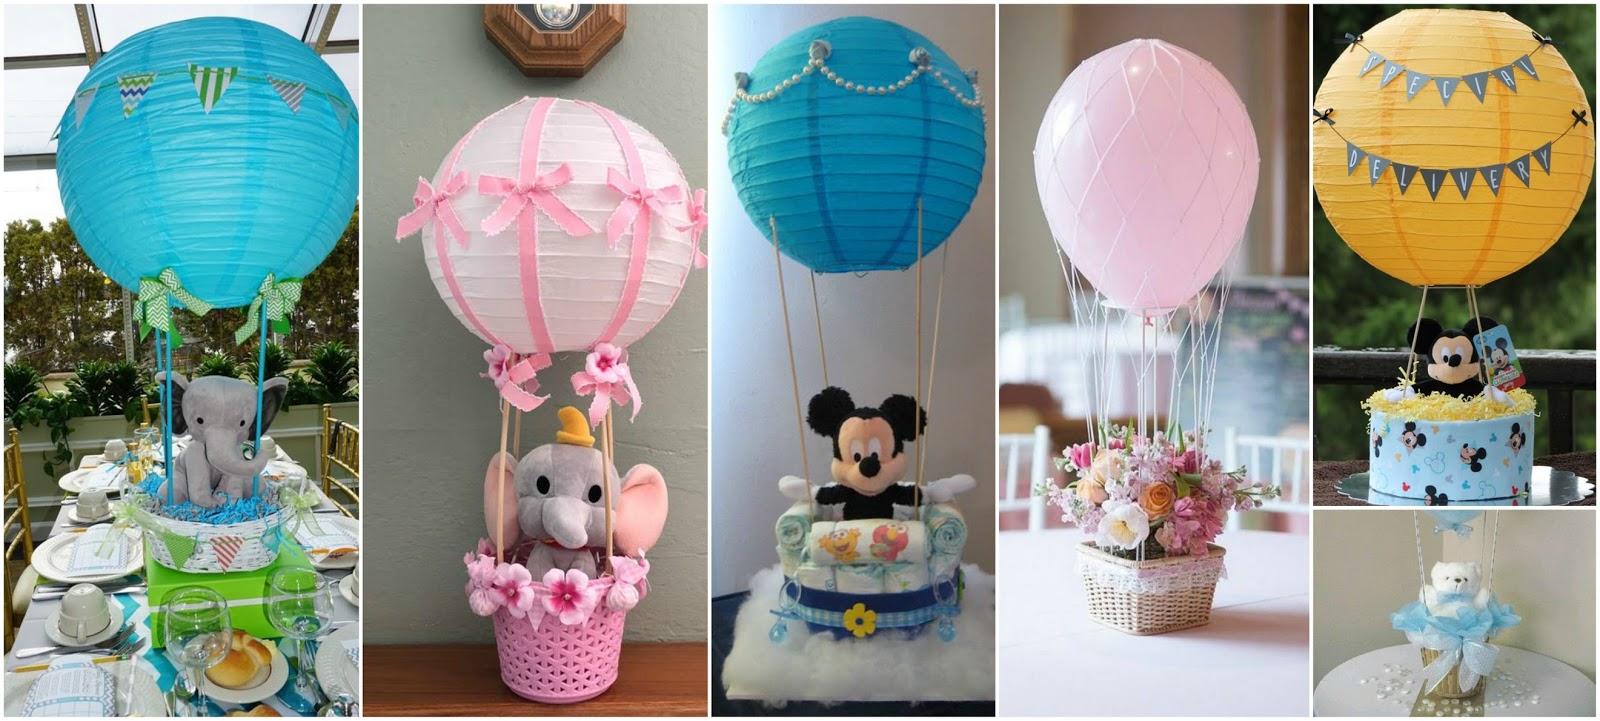 12 Centros de mesa con forma de globos aerostticos para baby shower